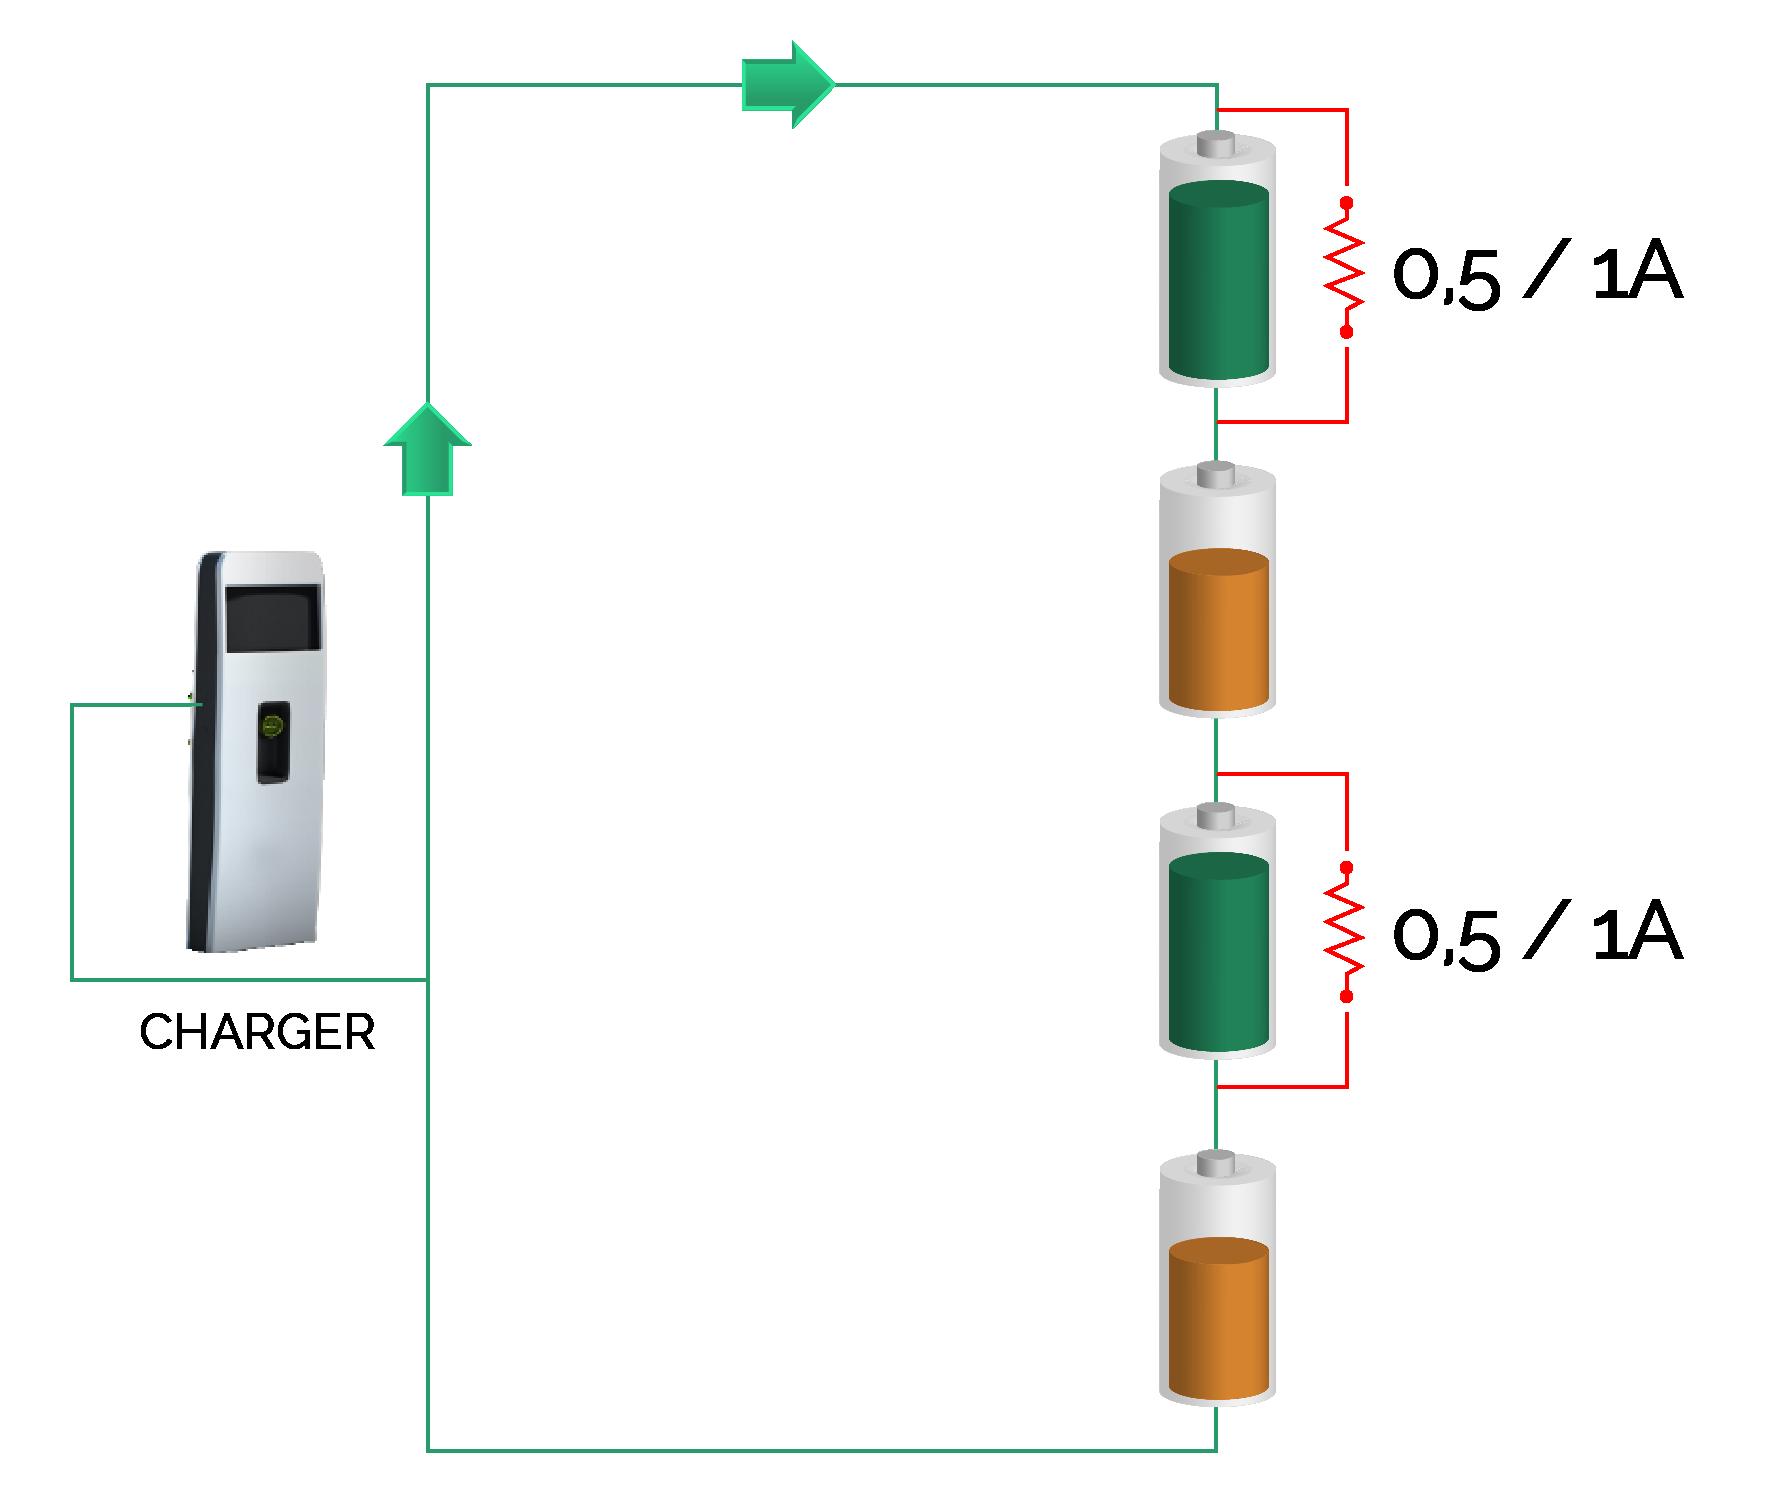 bms balancing lithium battery